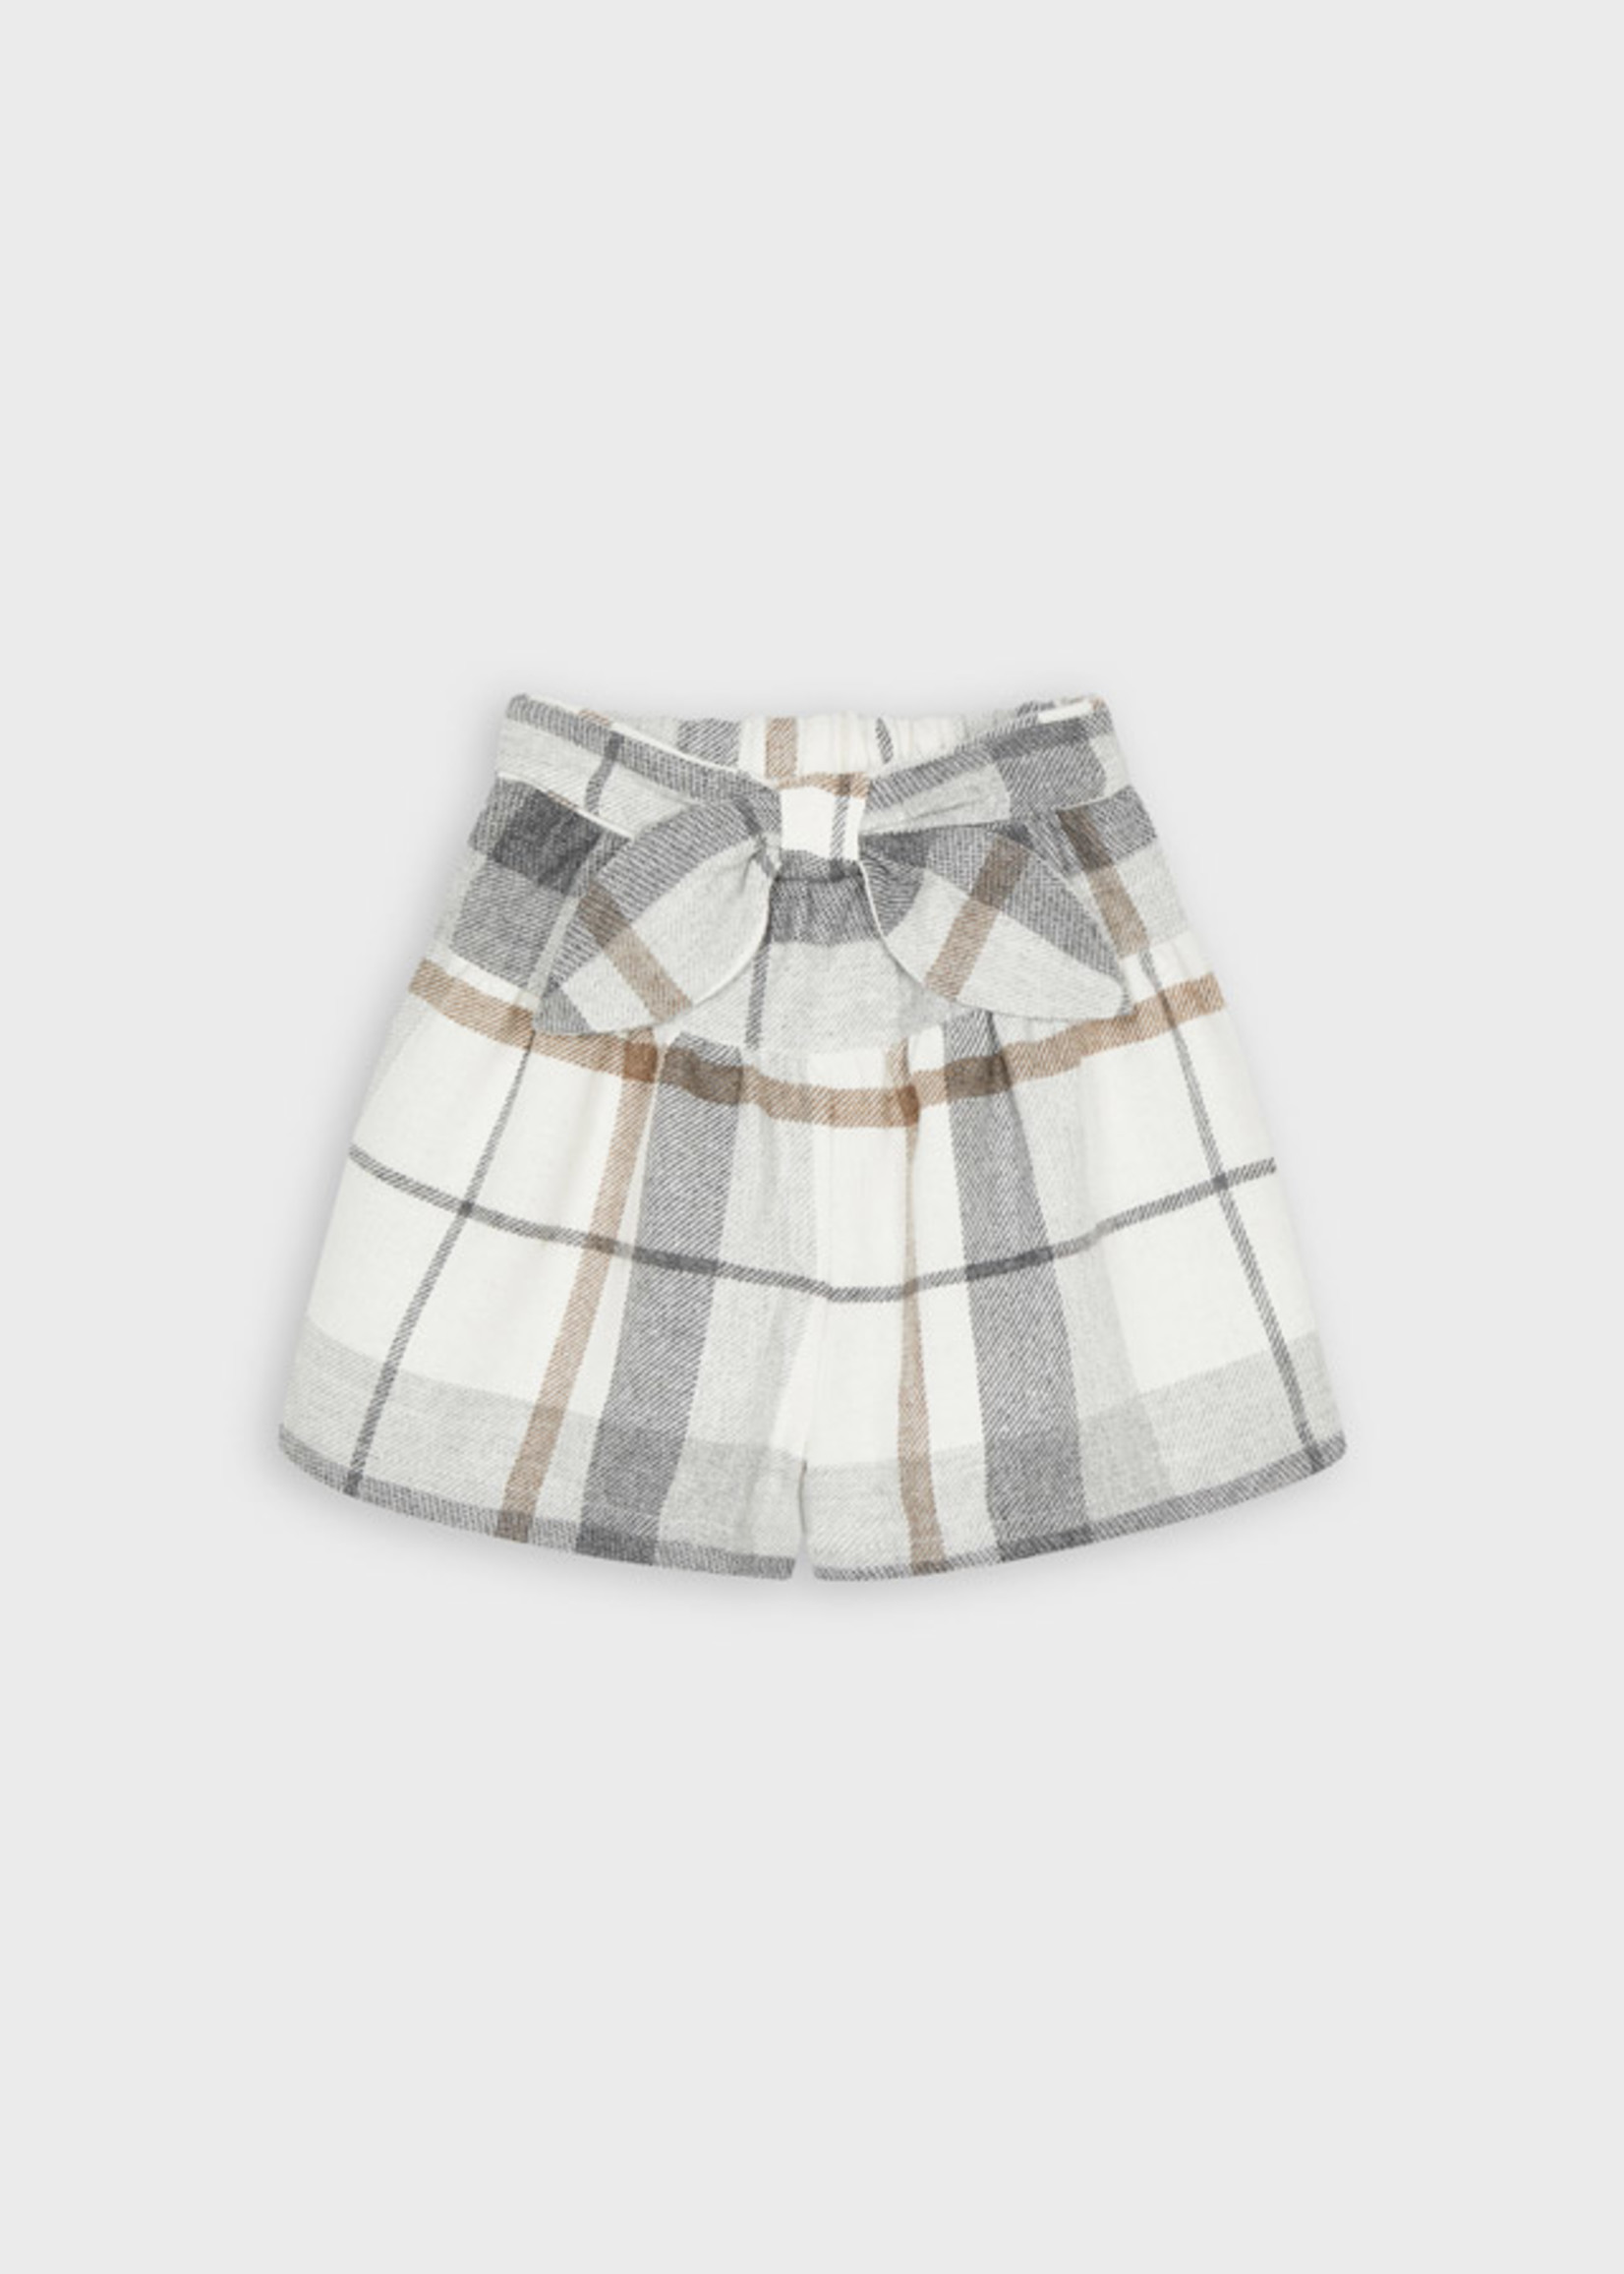 Mayoral Mayoral plaid skirt/pant